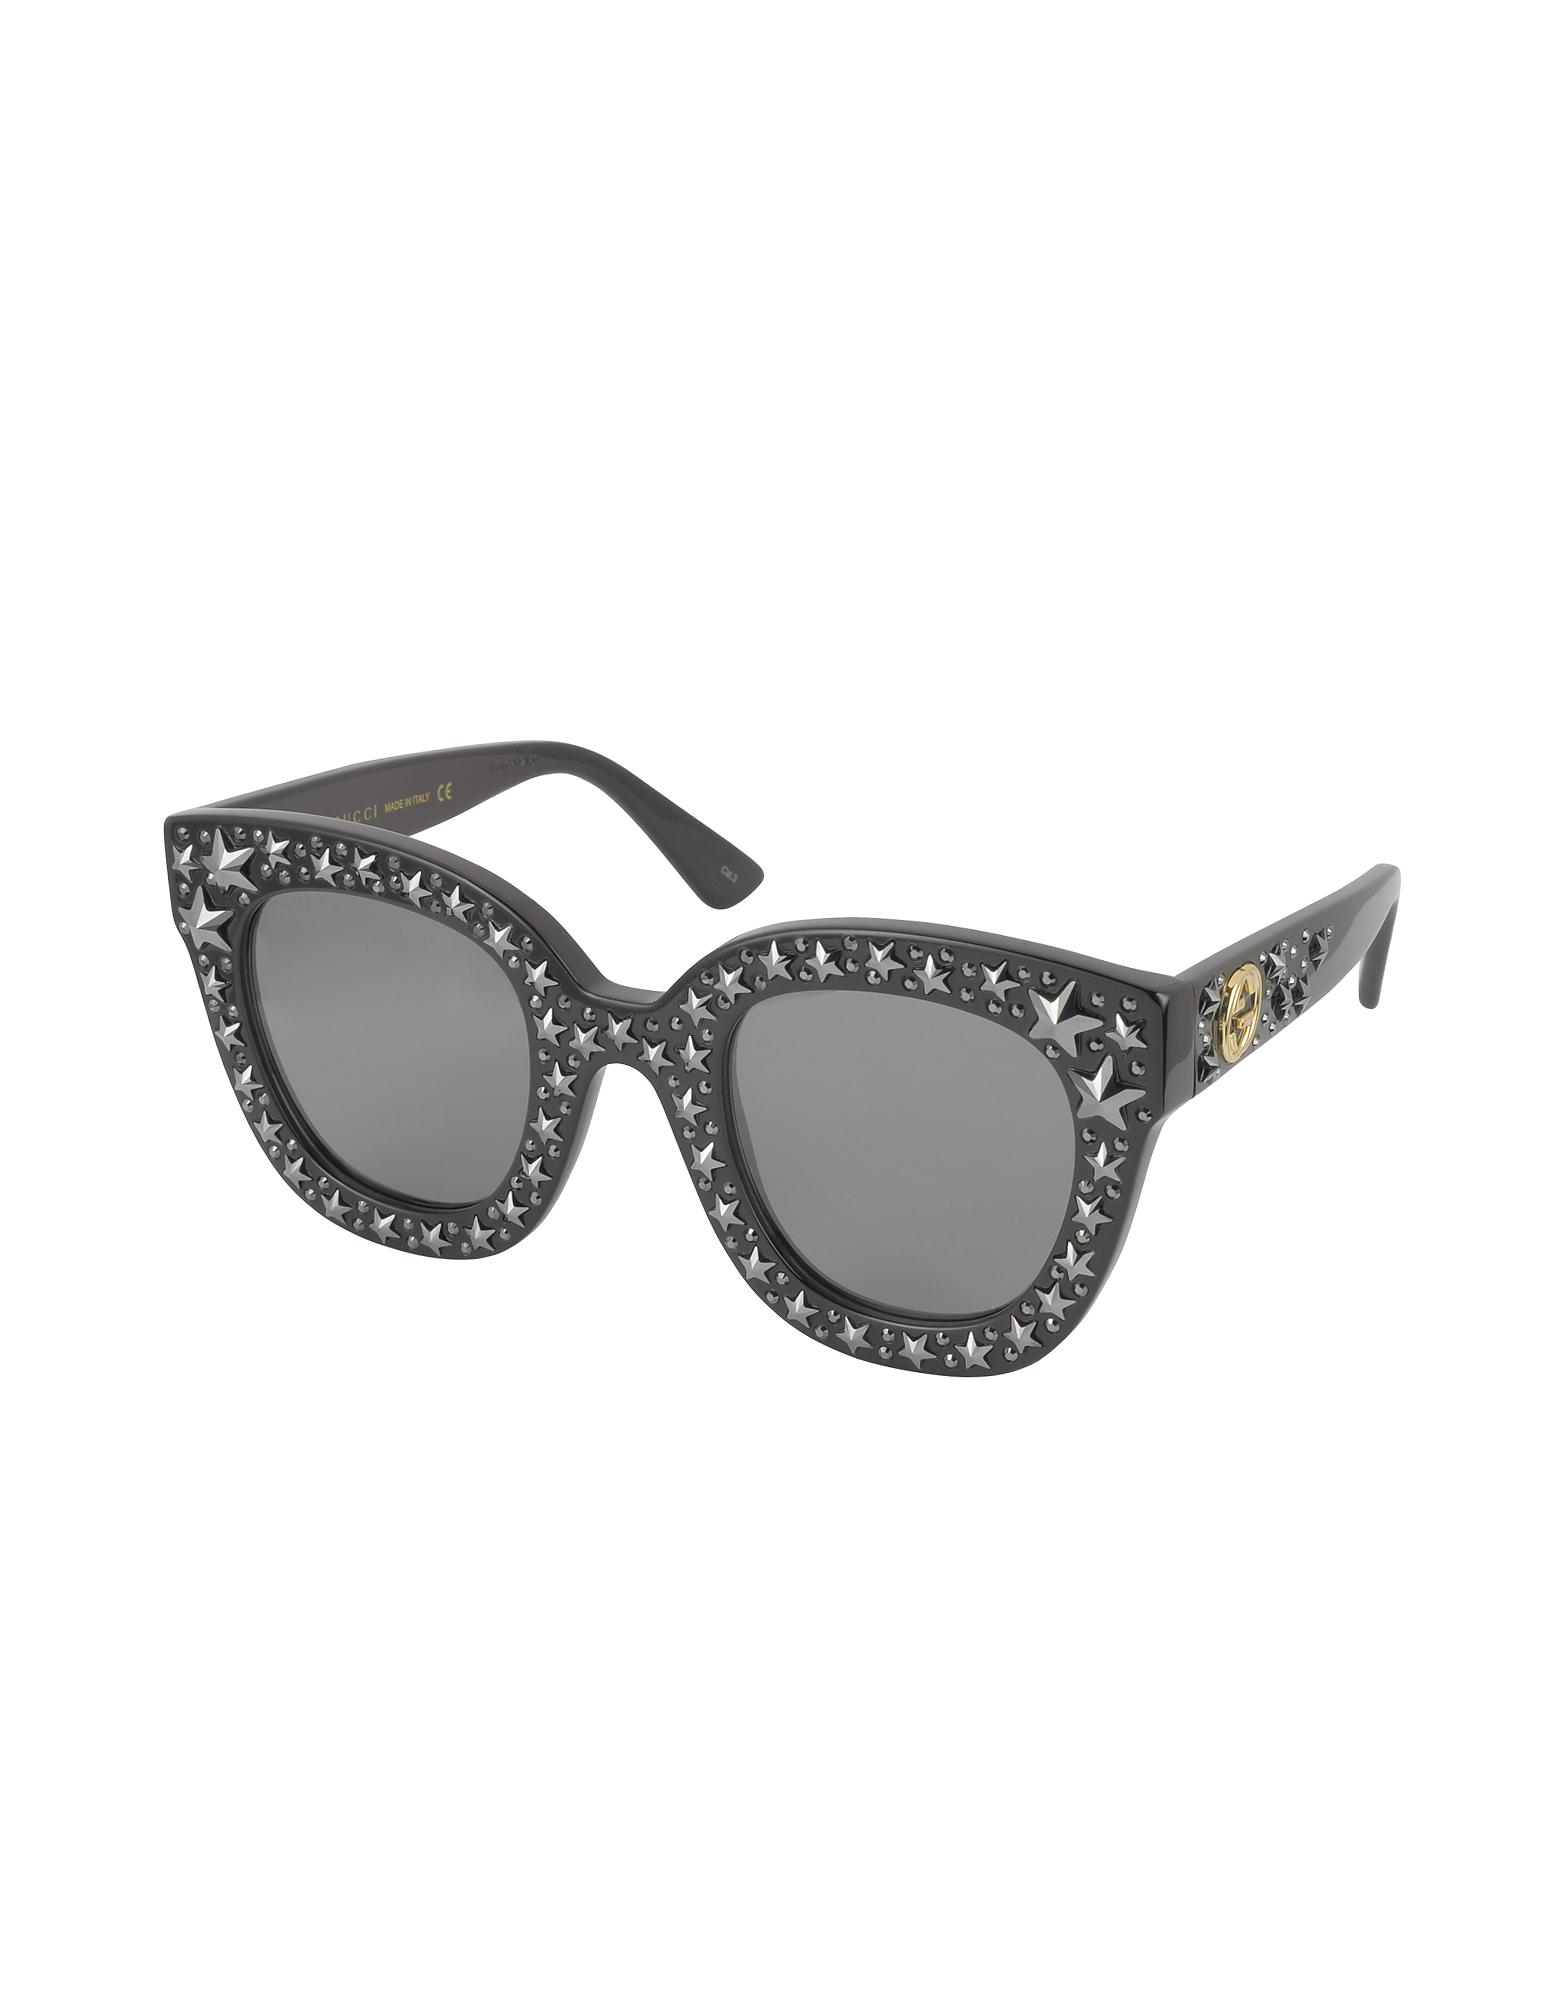 3965bc3630e Lyst - Gucci Gg0116s Acetate Cat Eye Women s Sunglasses W stars in Black